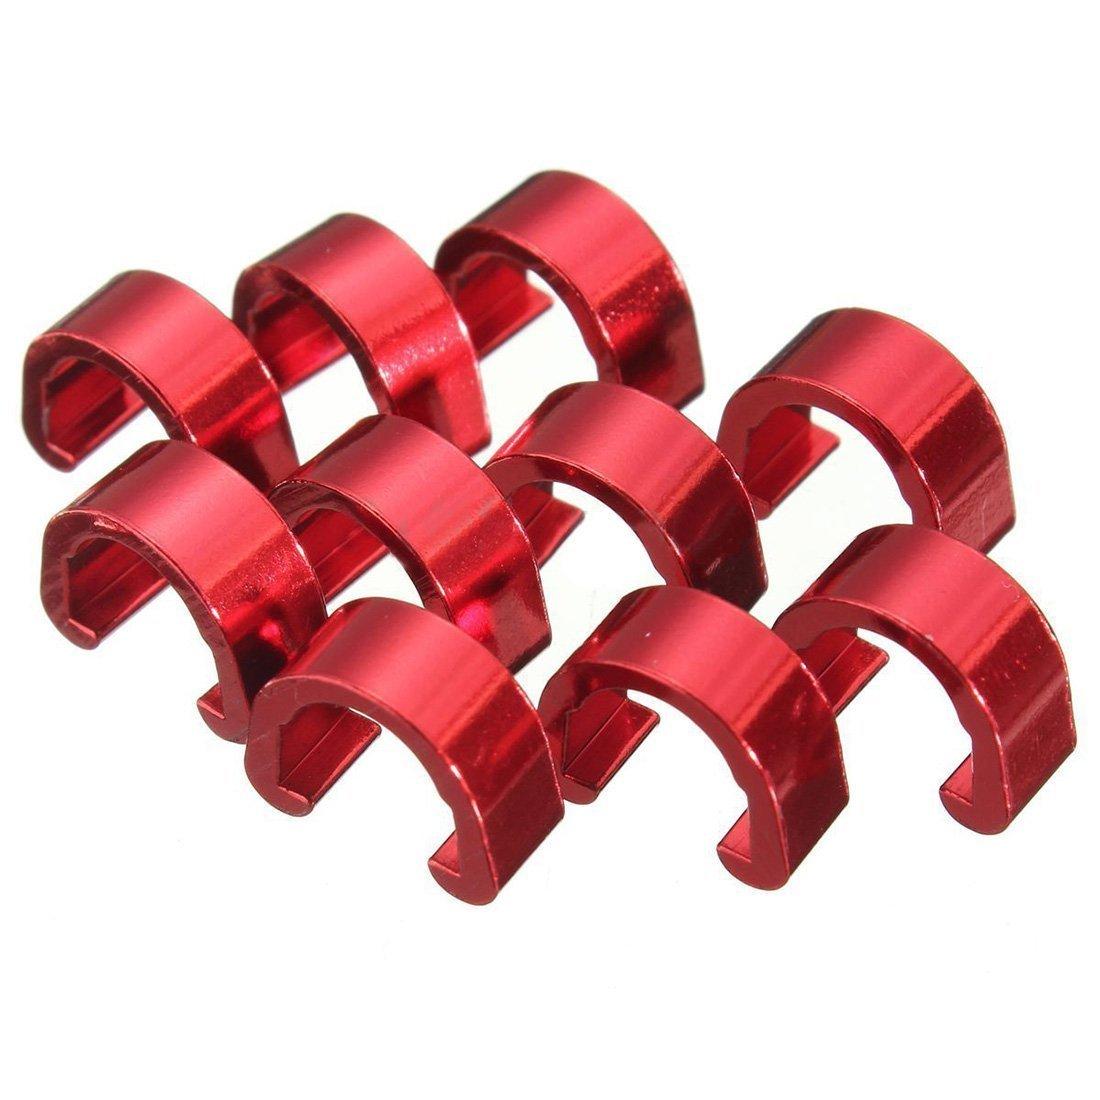 C-Clip - SODIAL(R)C-Clip 10pcs Snap Tubes Brake Hose Guide MTB BMX bike Color: Red